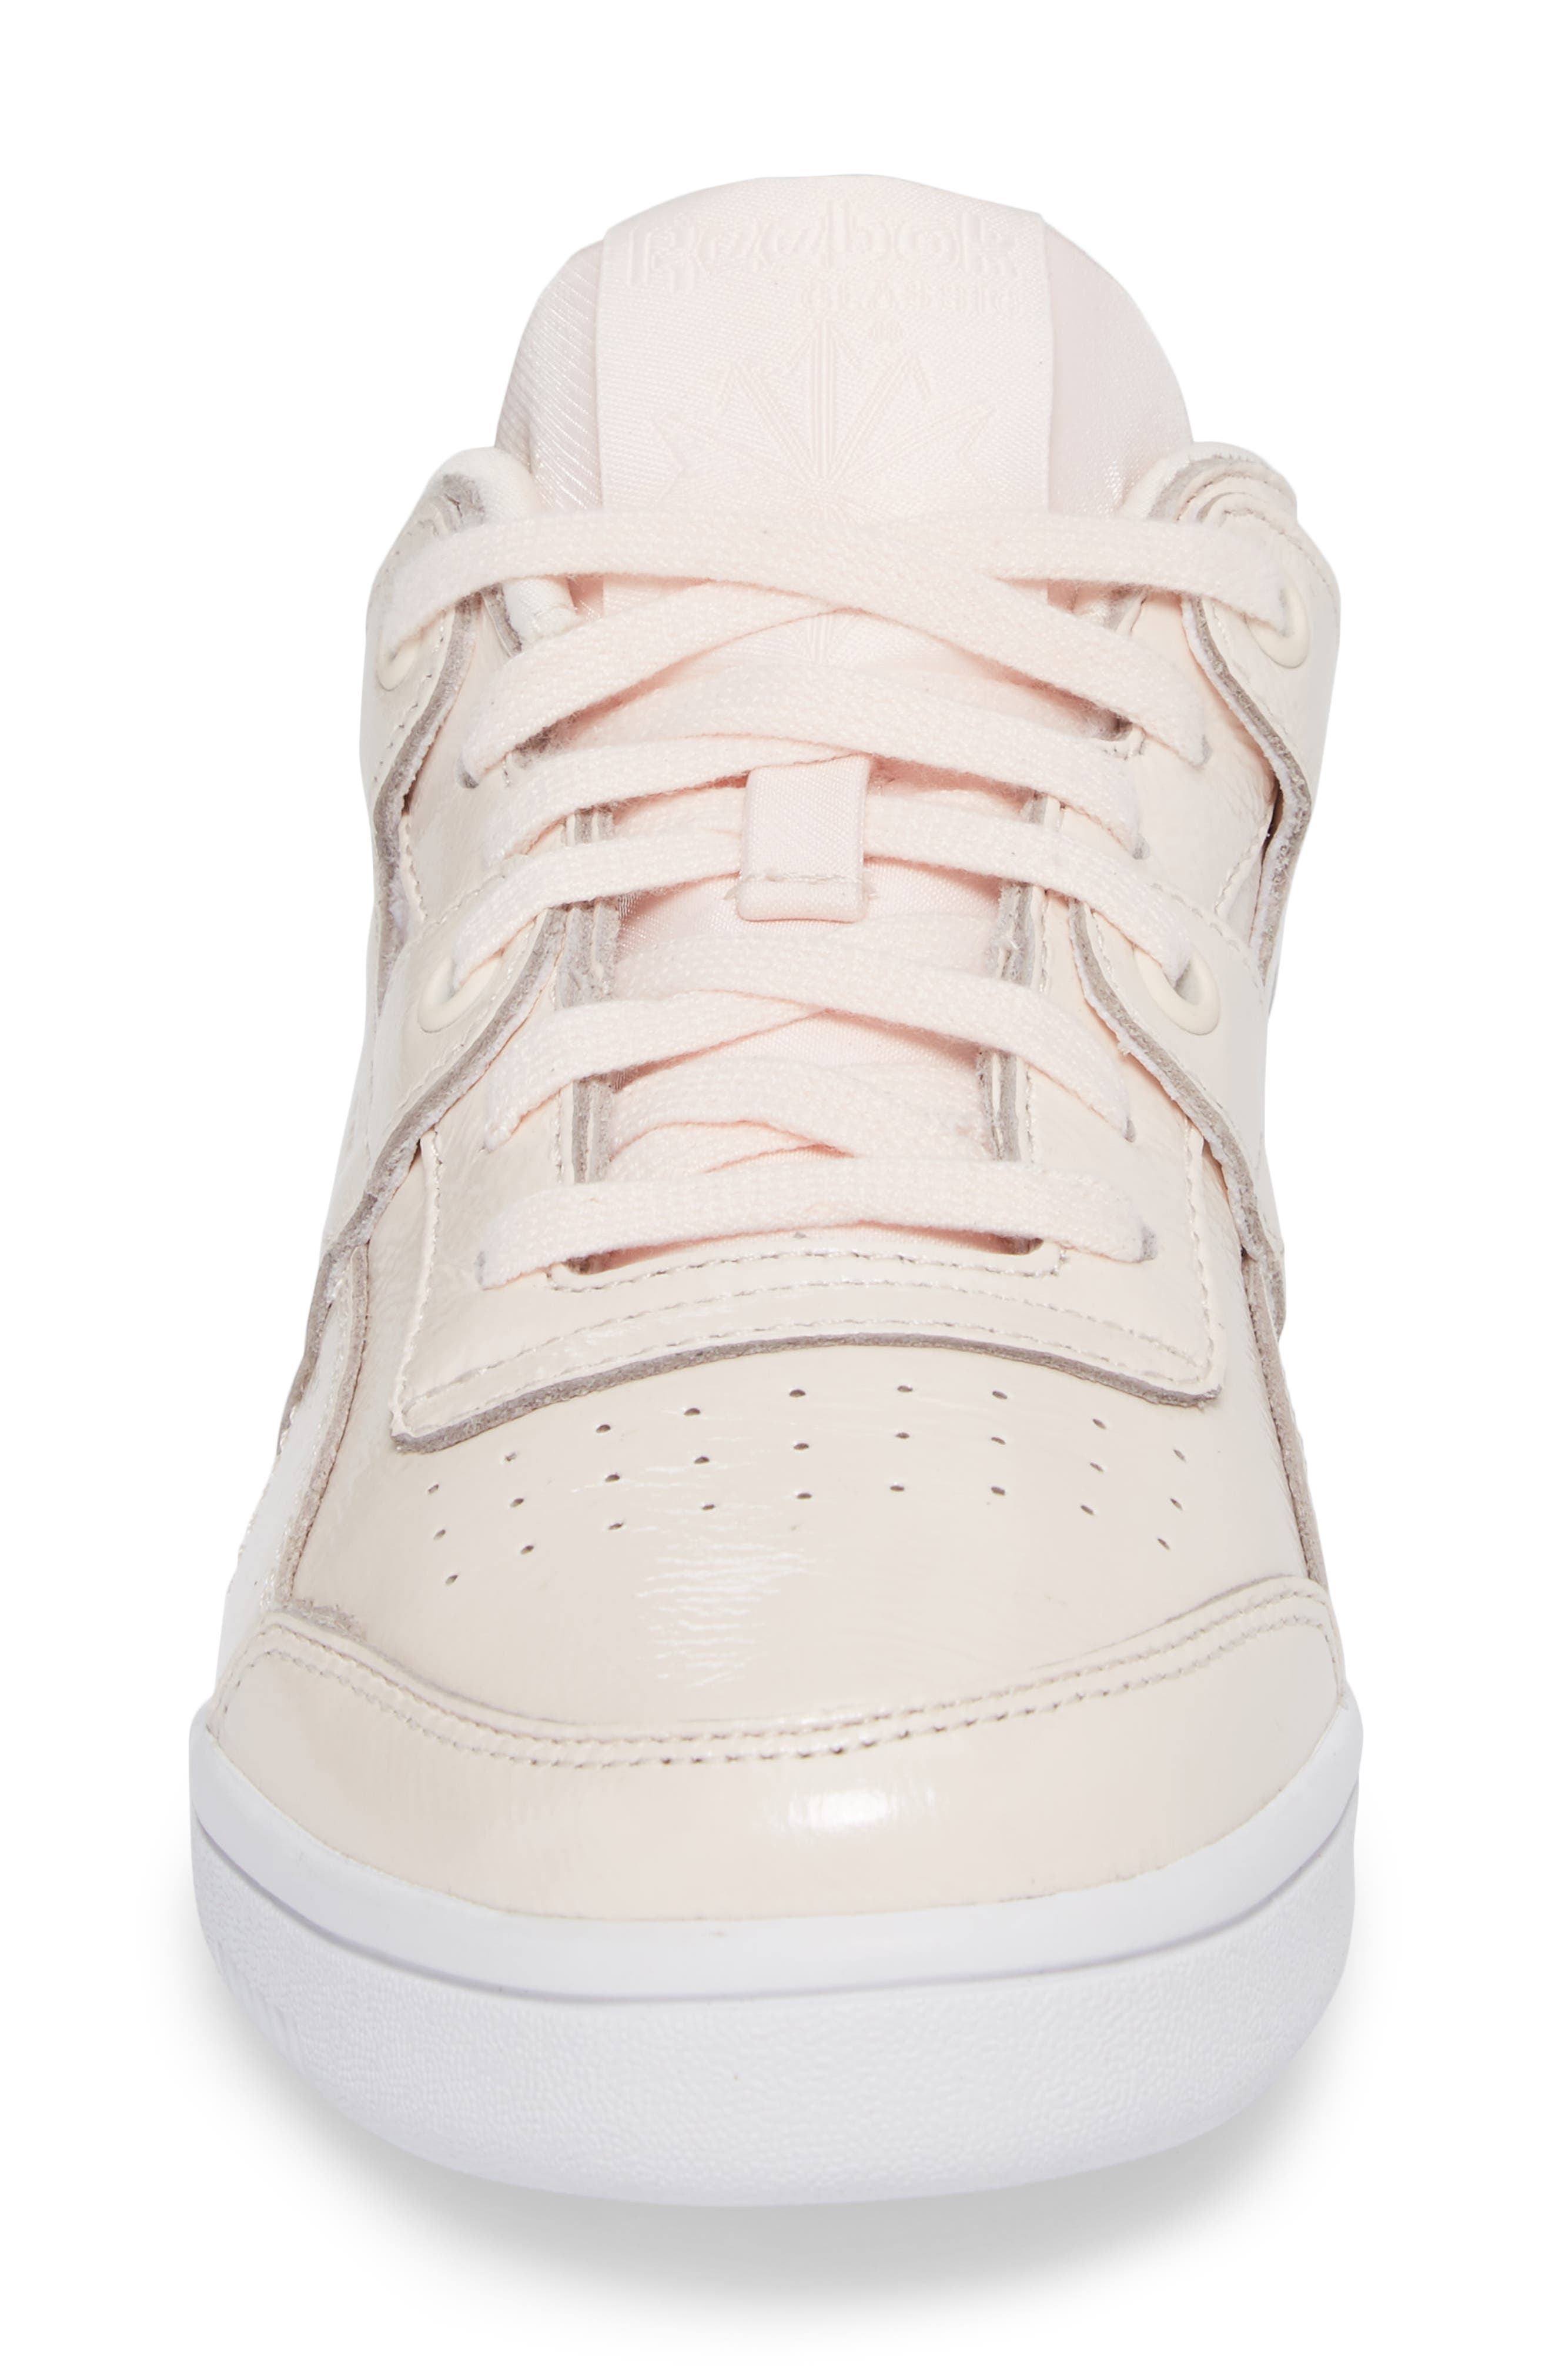 Workout Lo Plus Iridescent Sneaker,                             Alternate thumbnail 4, color,                             650